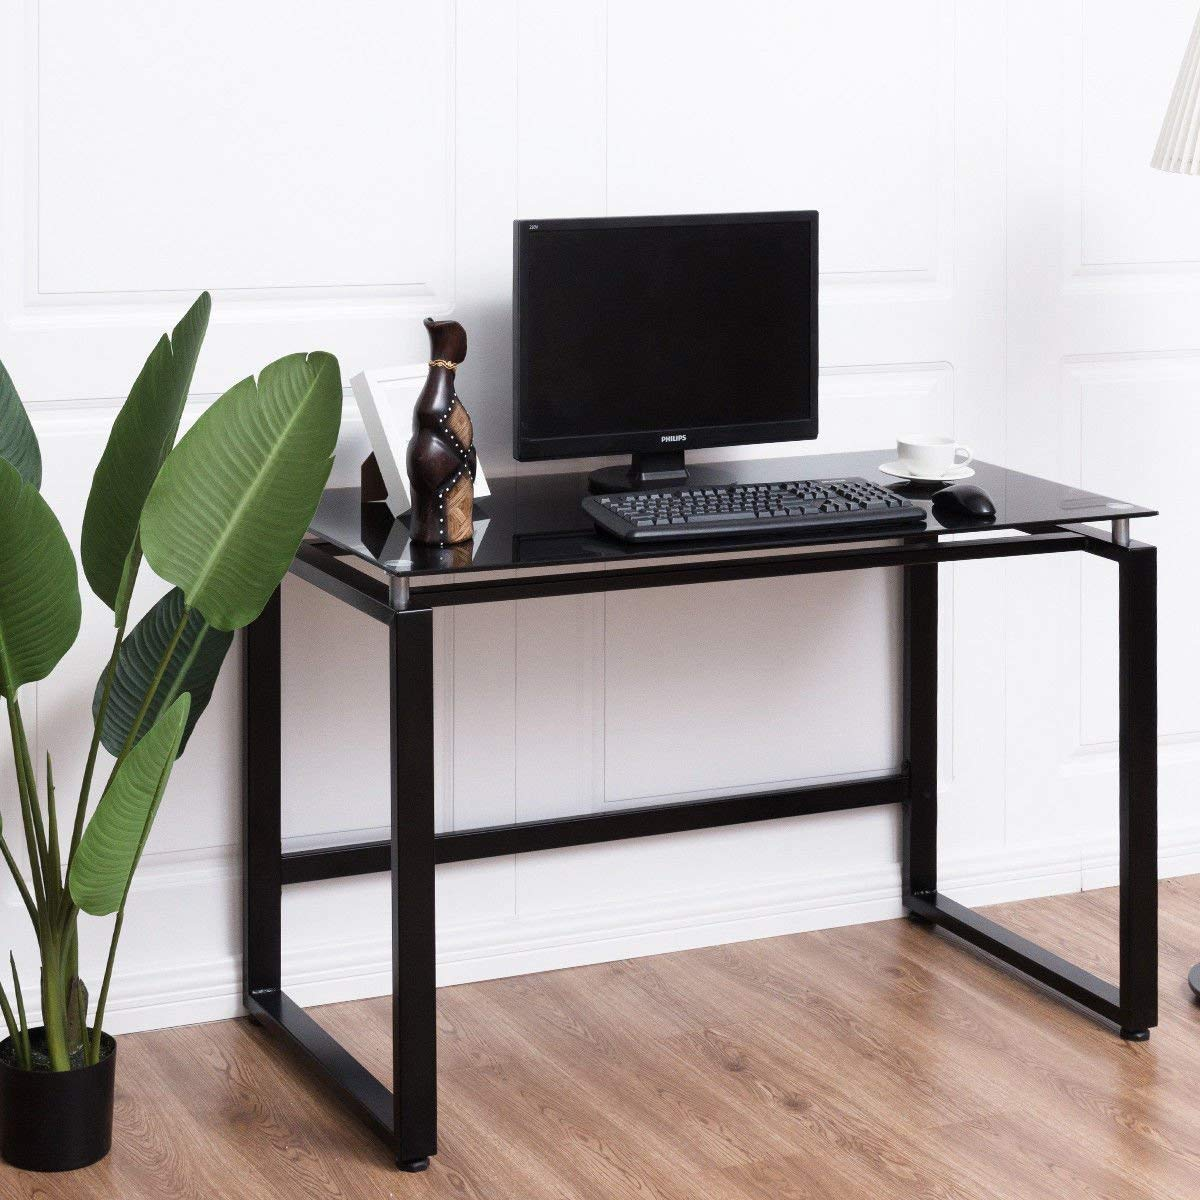 Buy Tangkula Computer Desk Home Office Workstation Glass Top